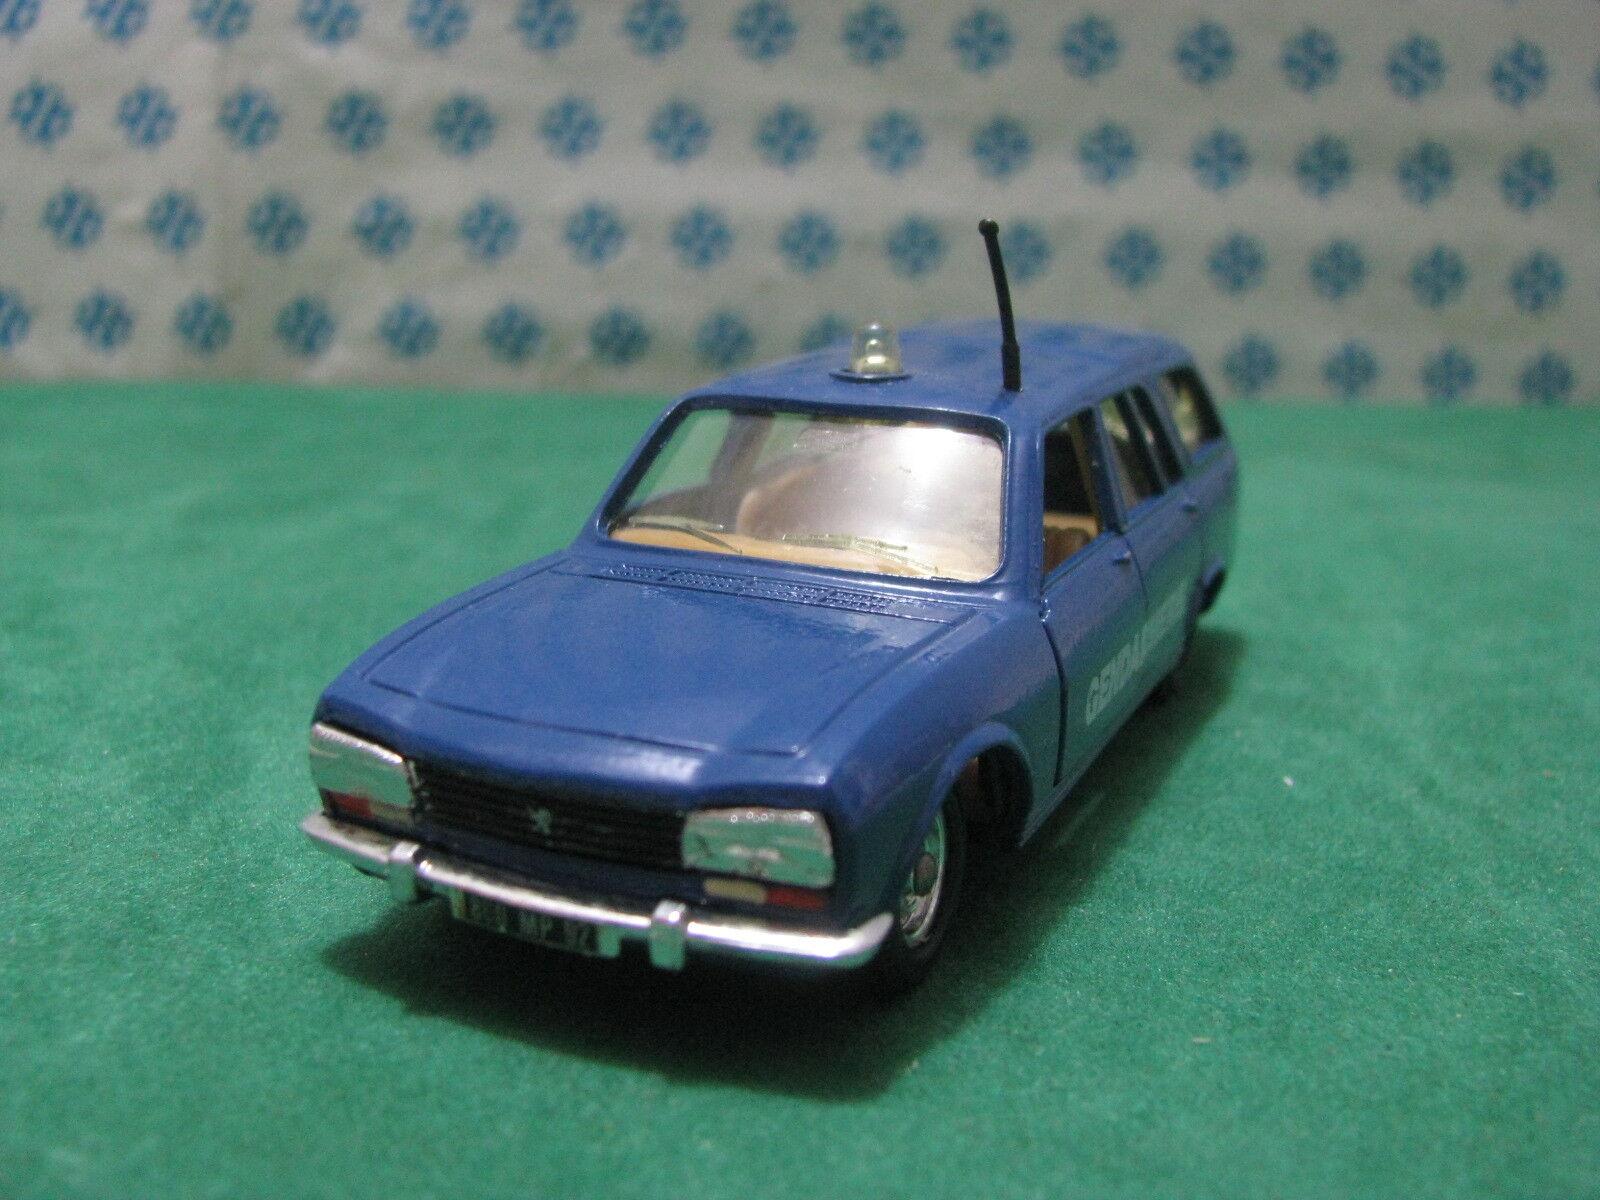 Vintage-PEUGEOT 504 2000cc. Break Gendarmerie - 1 43 Solid No. 23